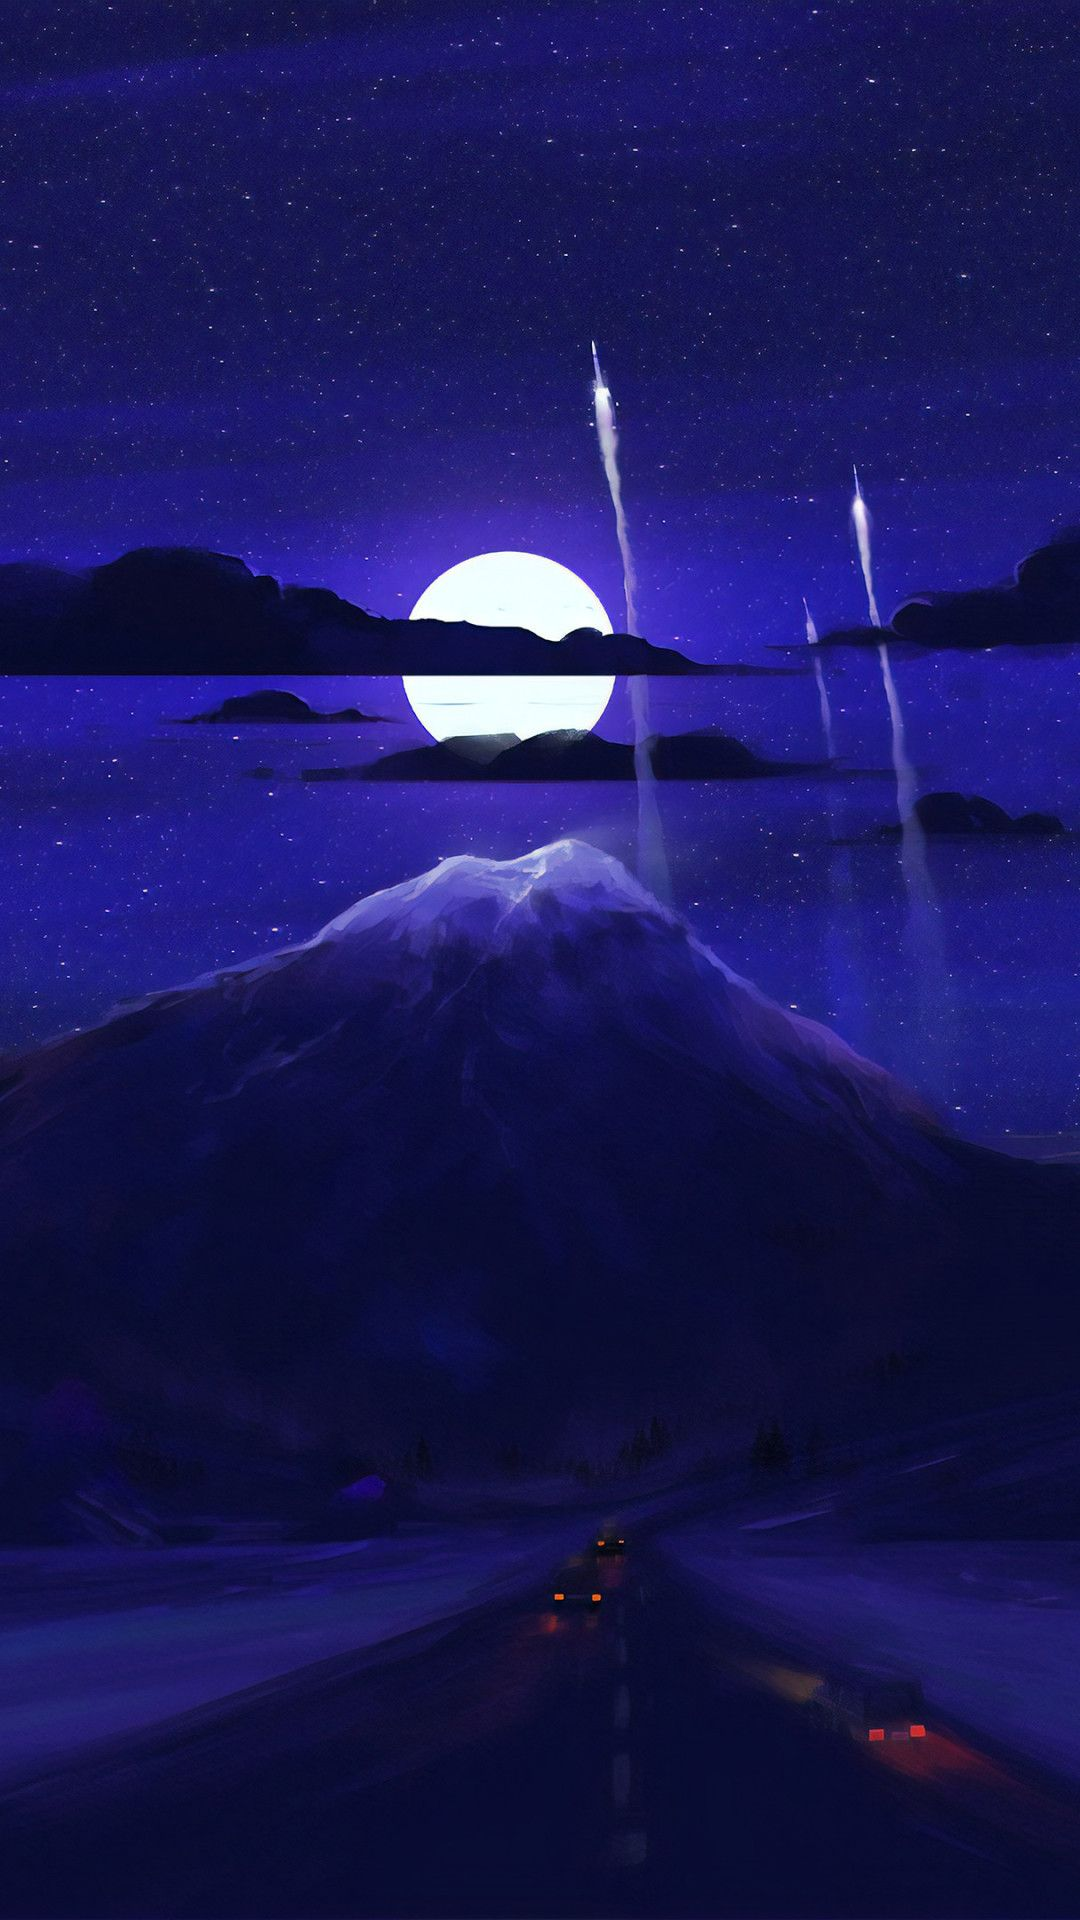 Dark Moon Night Minimal Art Mobile Wallpaper (iPhone